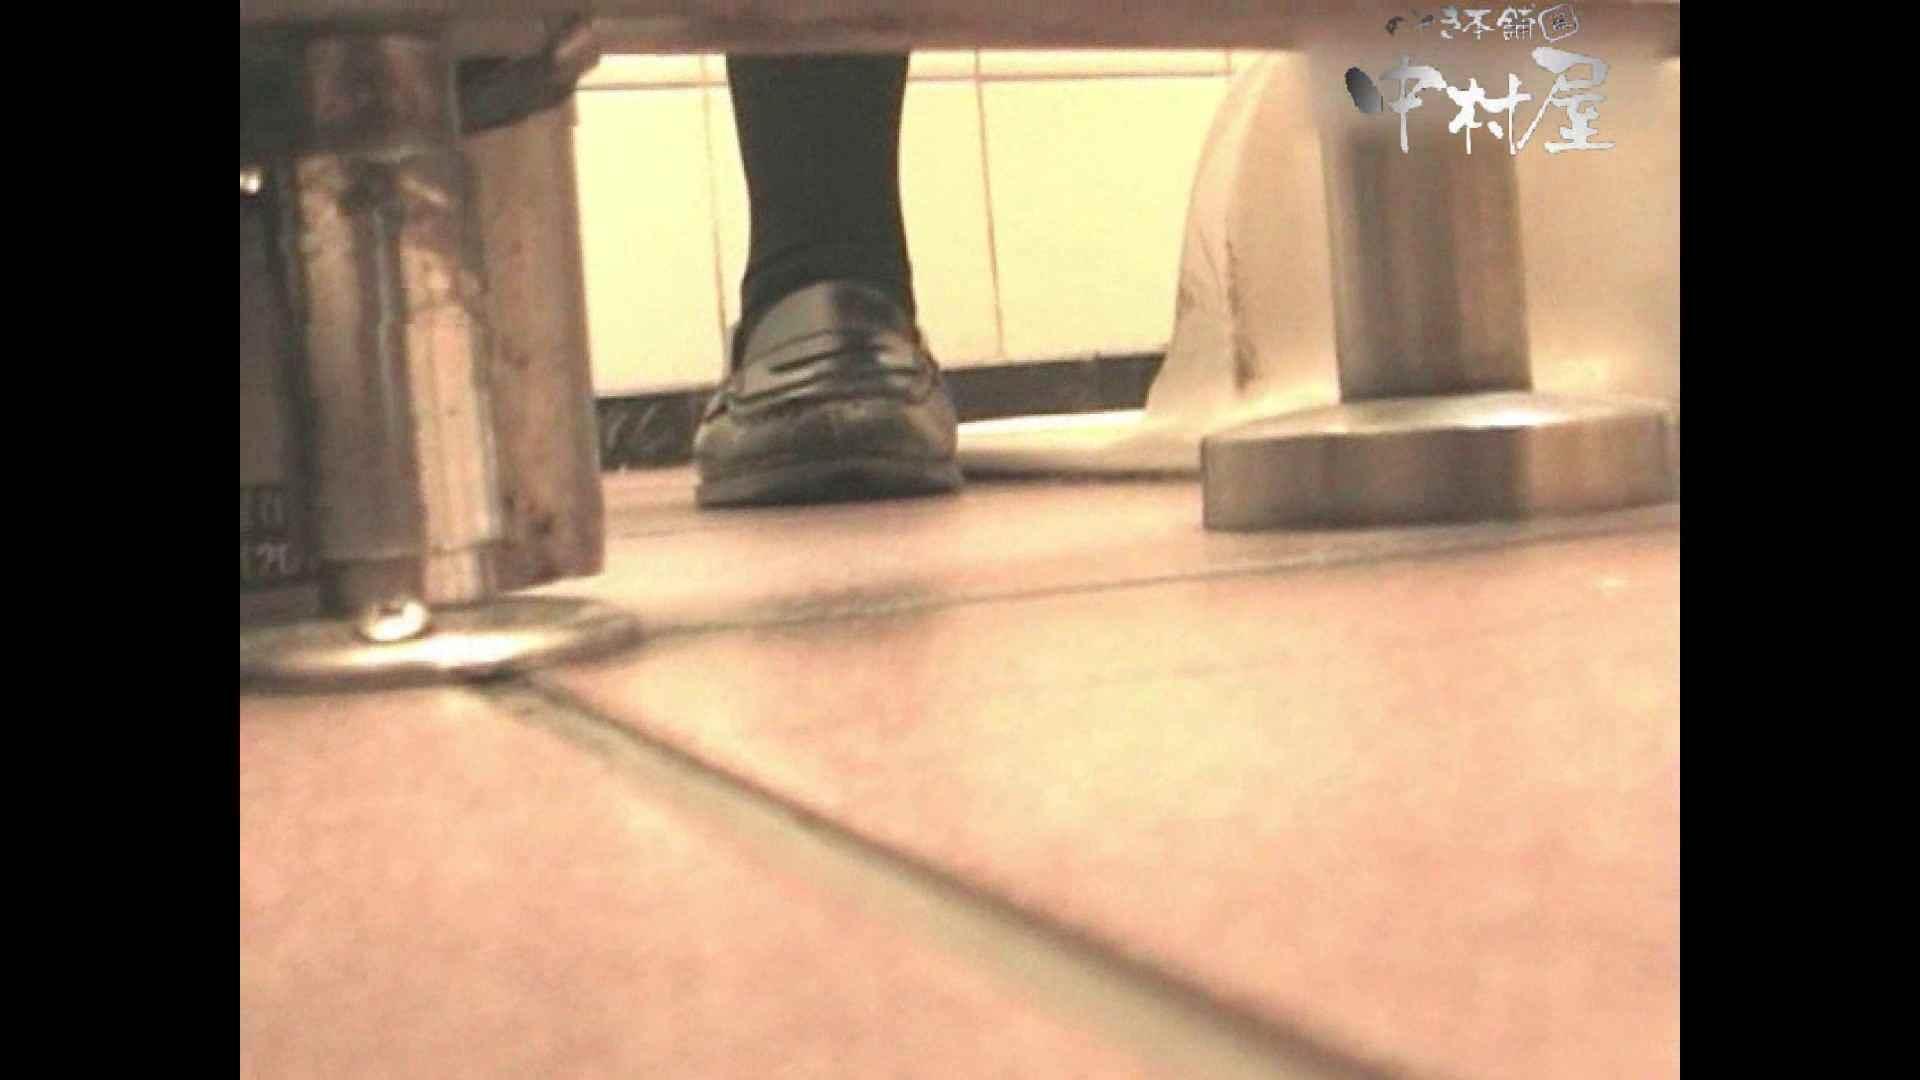 岩手県在住盗撮師盗撮記録vol.05 オマンコ秘宝館 セックス画像 20連発 4